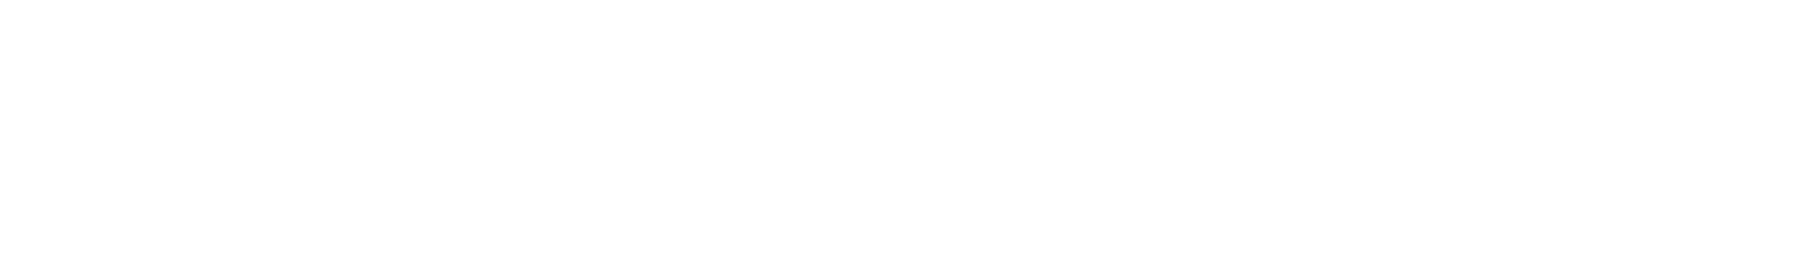 shg percussion loop 31